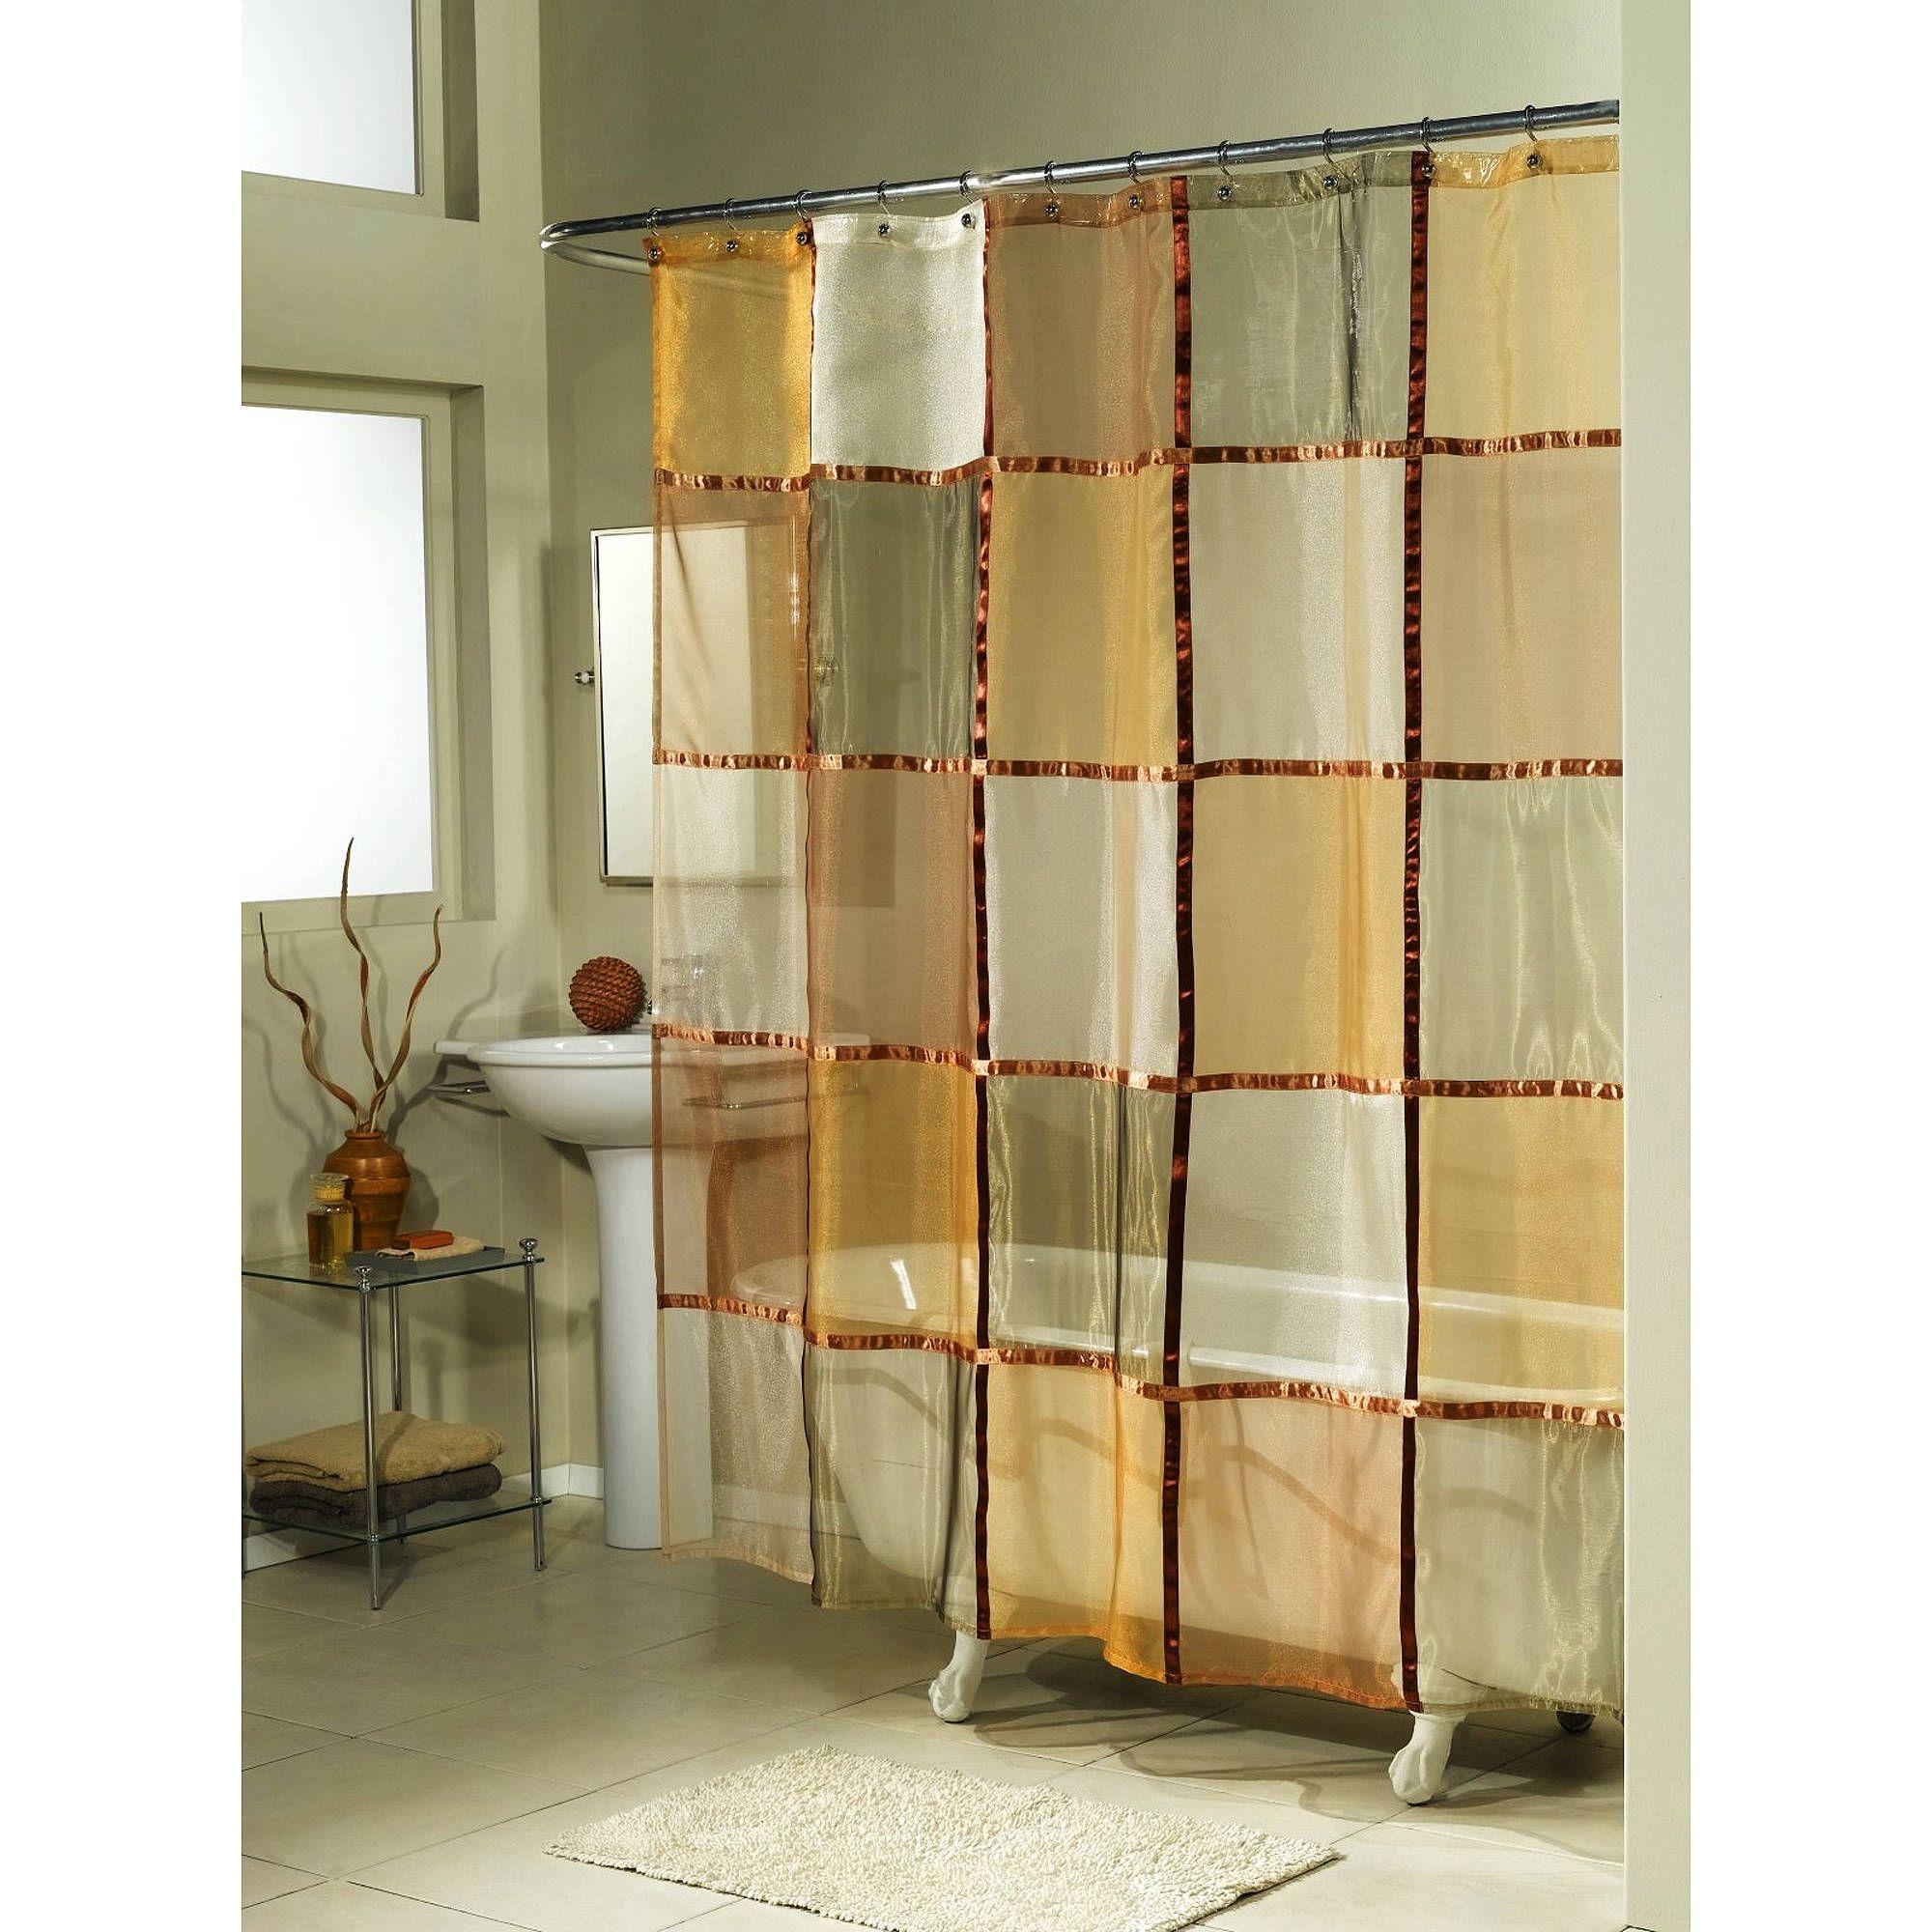 Copper Colored Shower Curtain Copper Colored Shower Curtain Ex